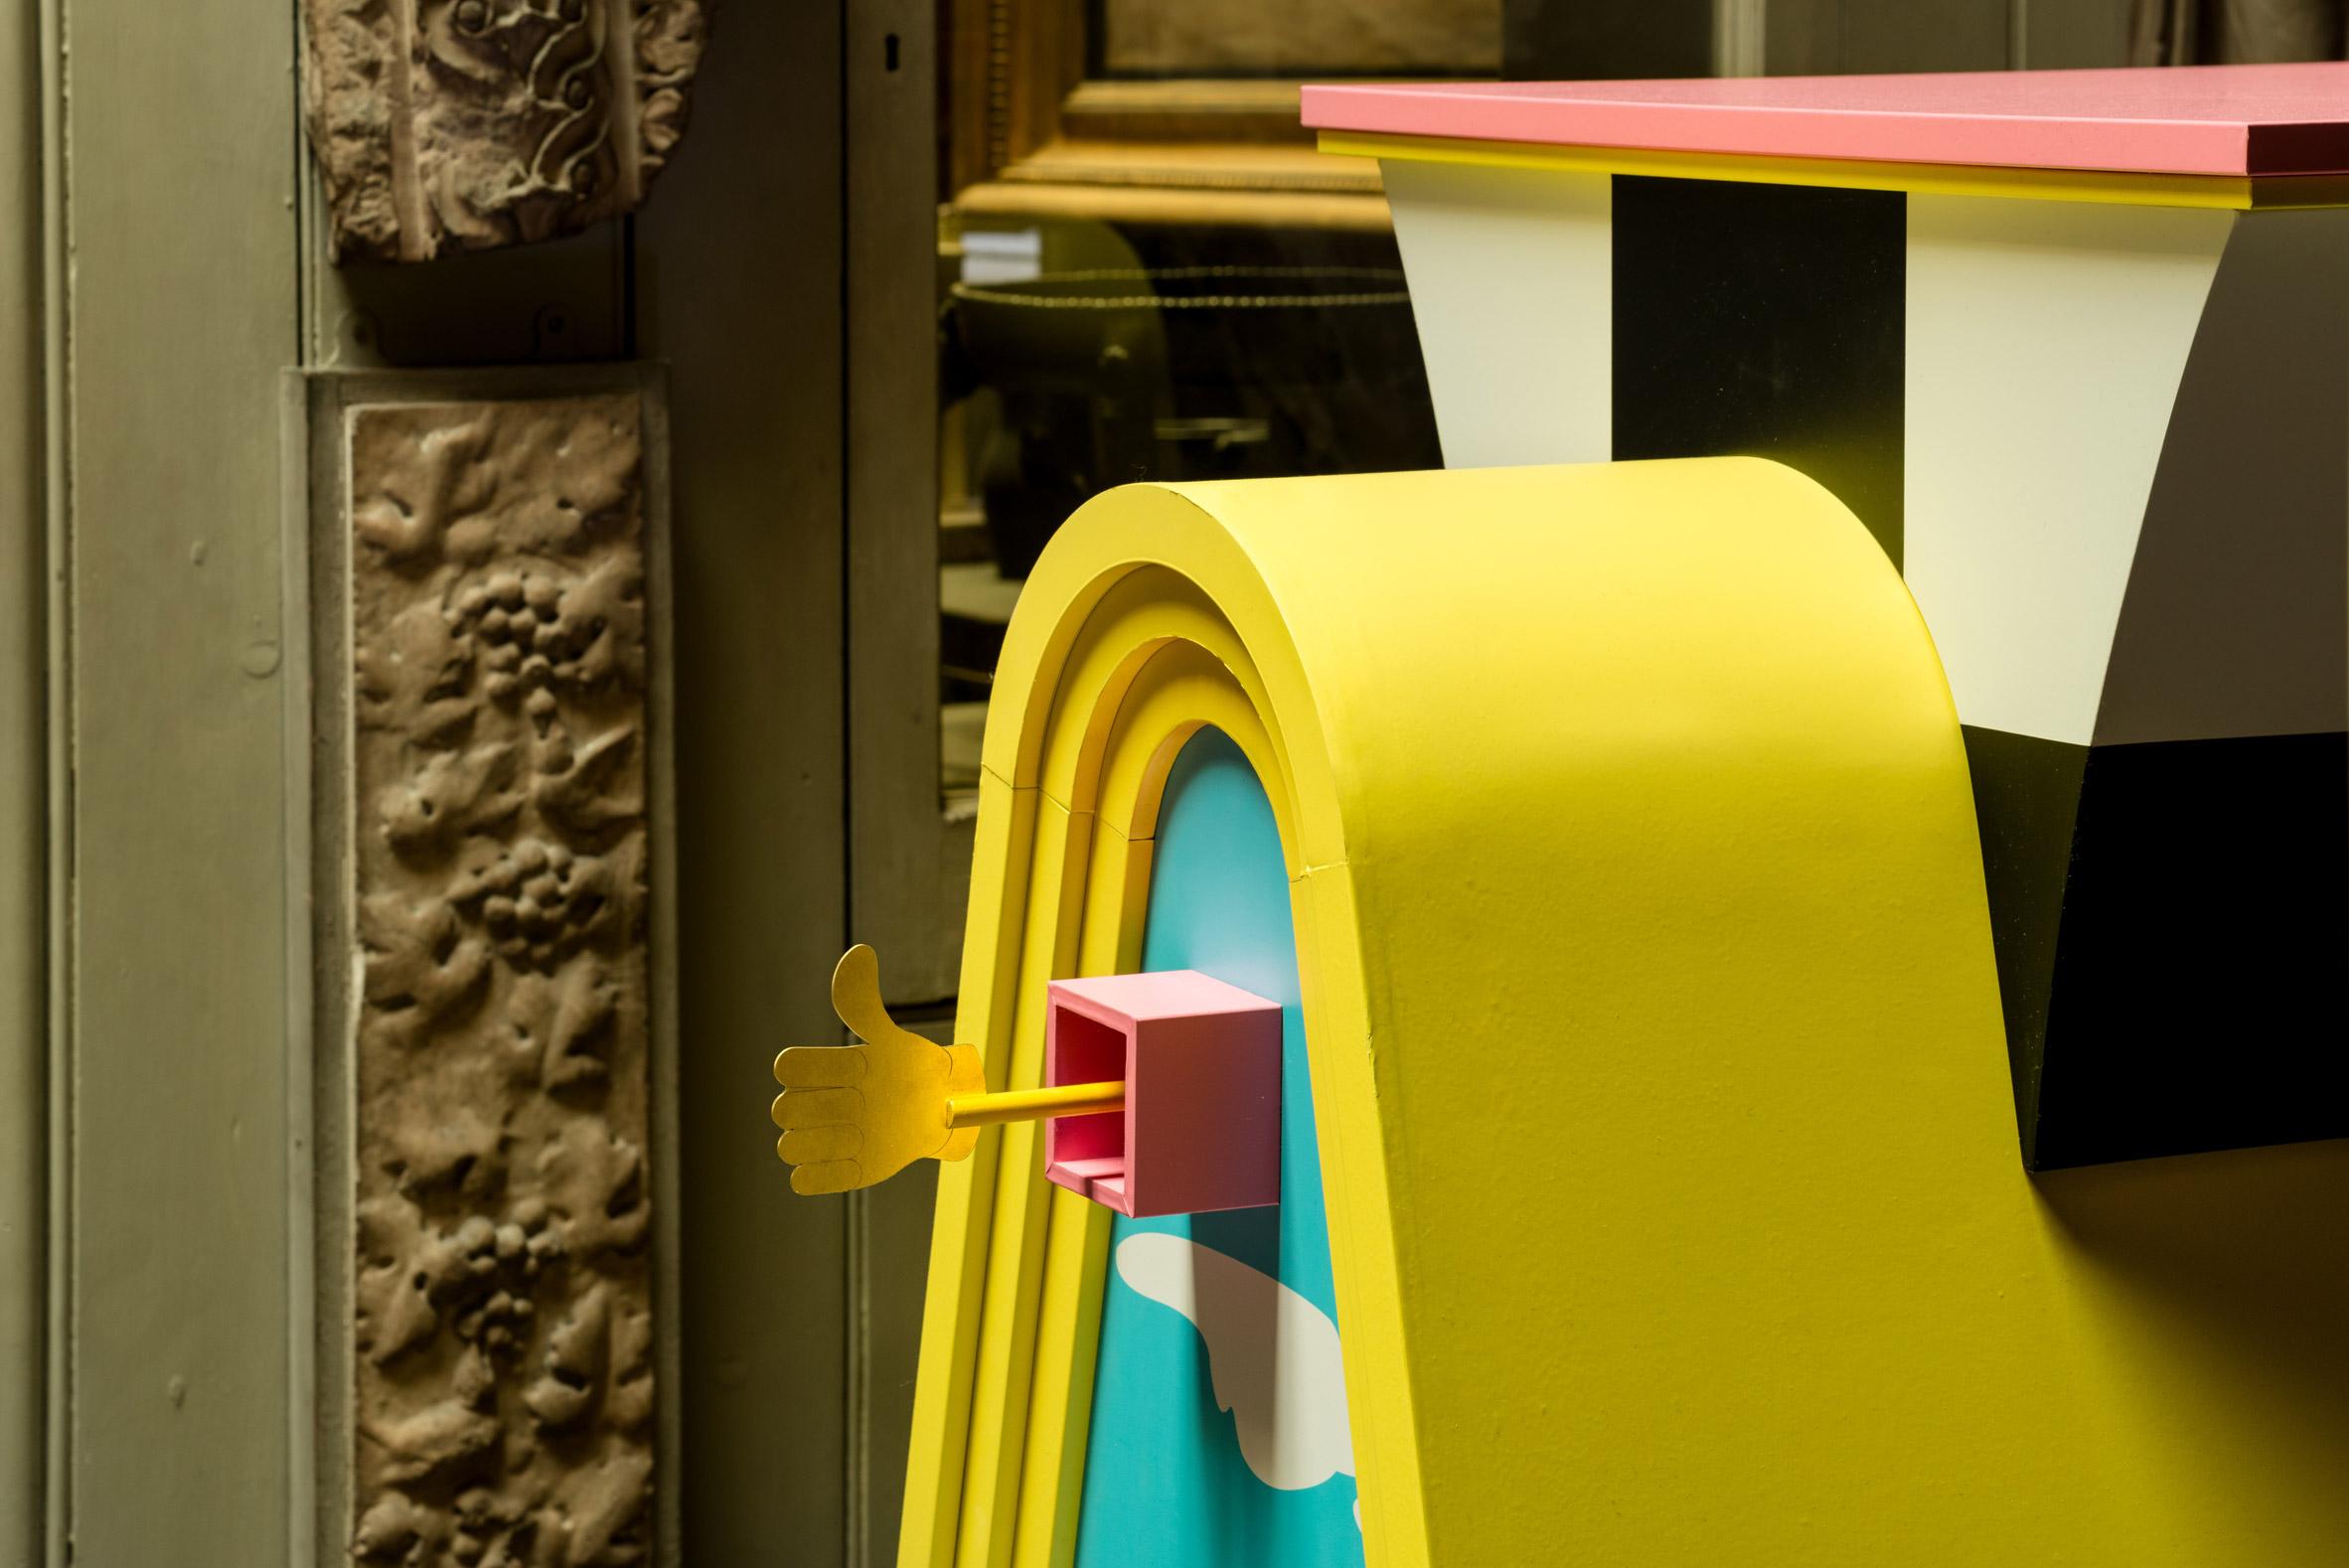 john-soane-architectural-characters-installation-london-uk_dezeen_2364_col_7.jpg